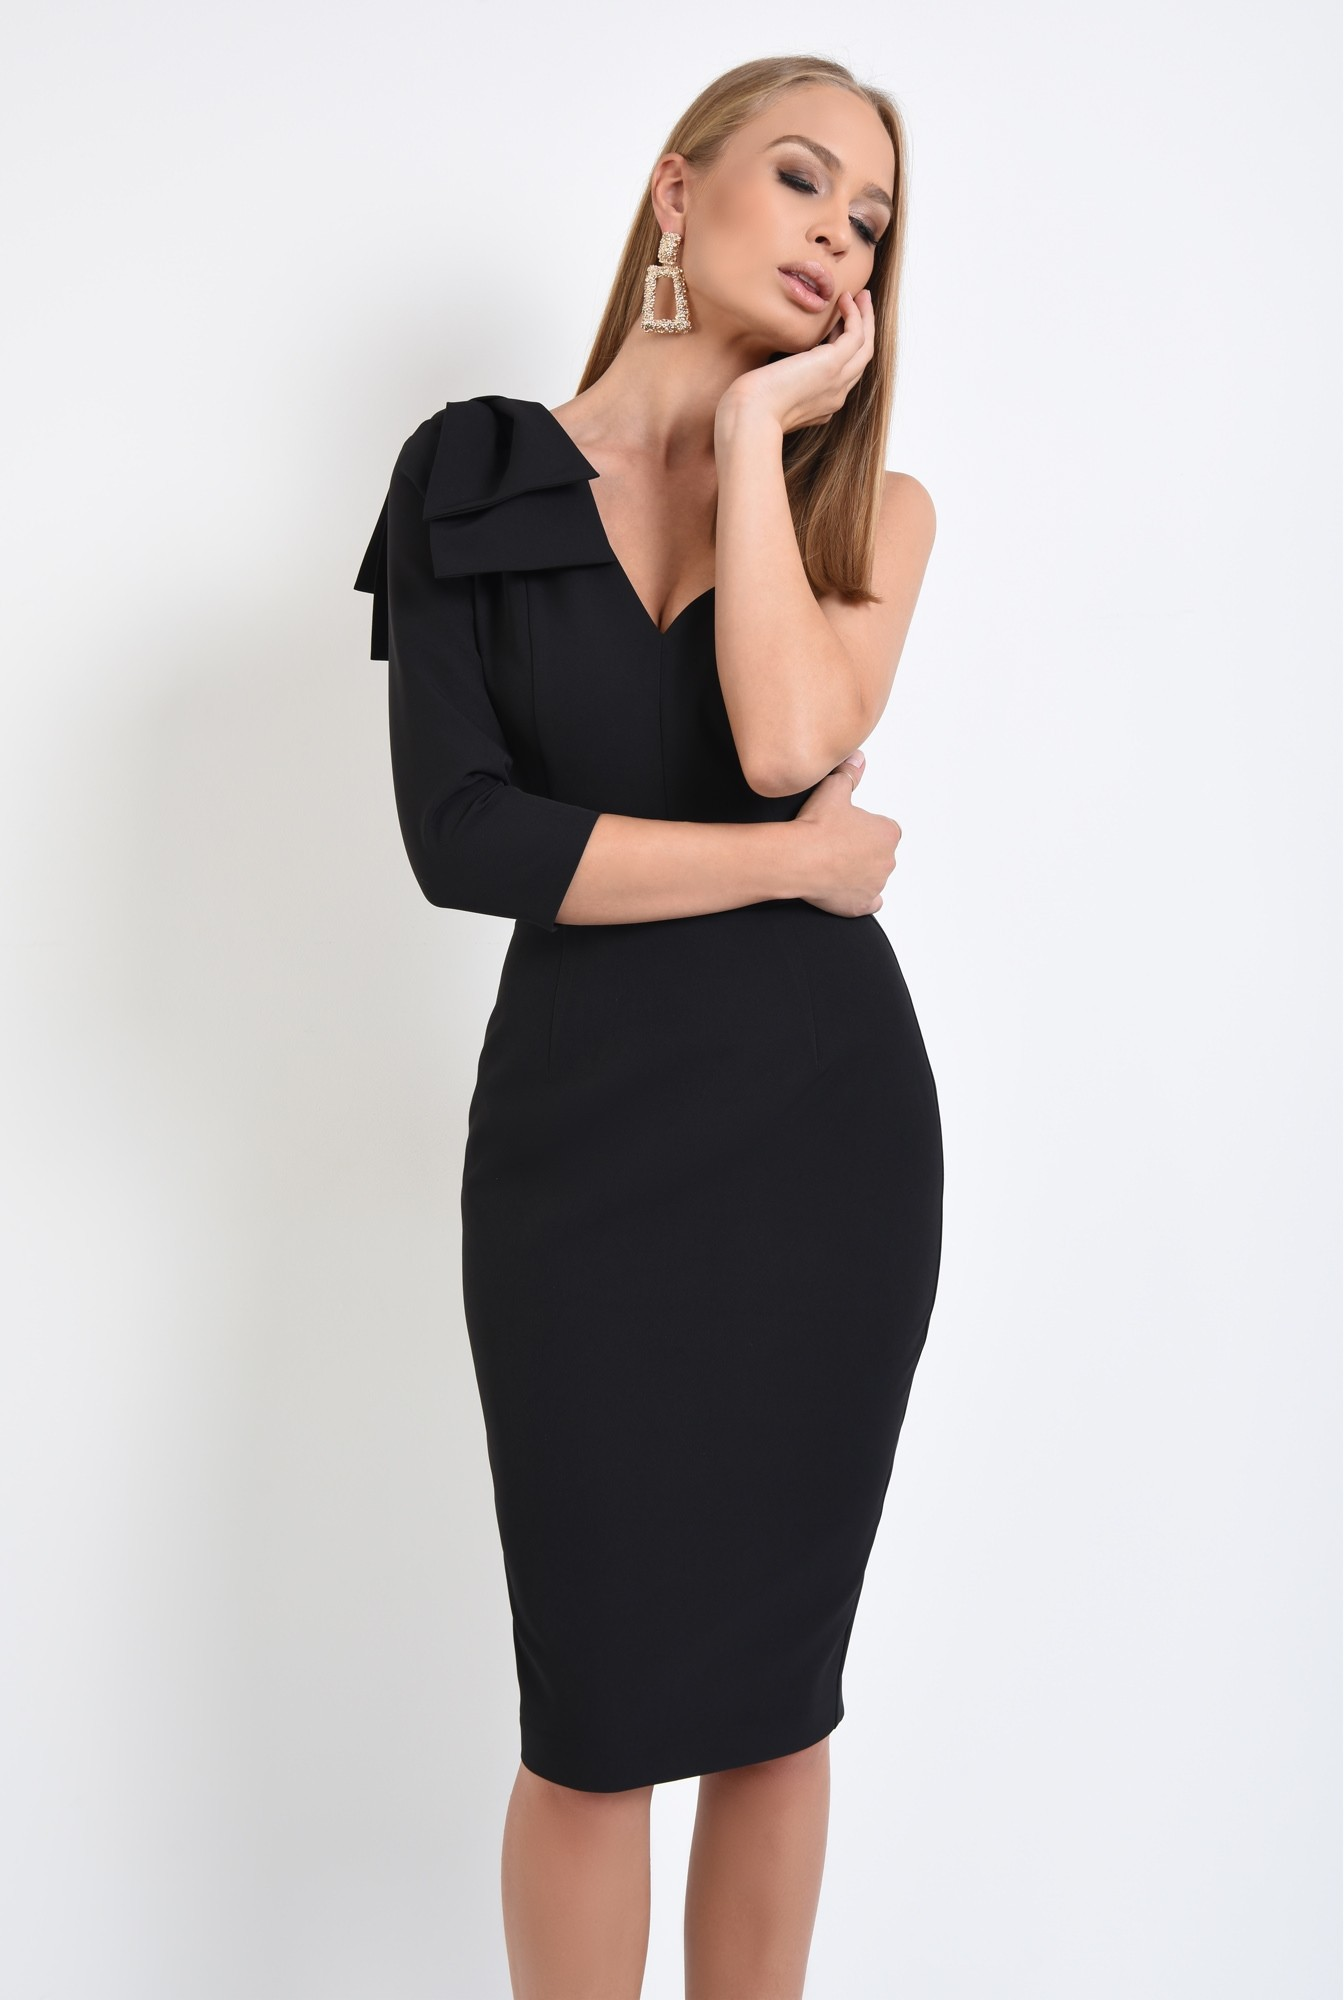 0 - 360 - rochie eleganta, conica, neagra, funda suprapusa la umar